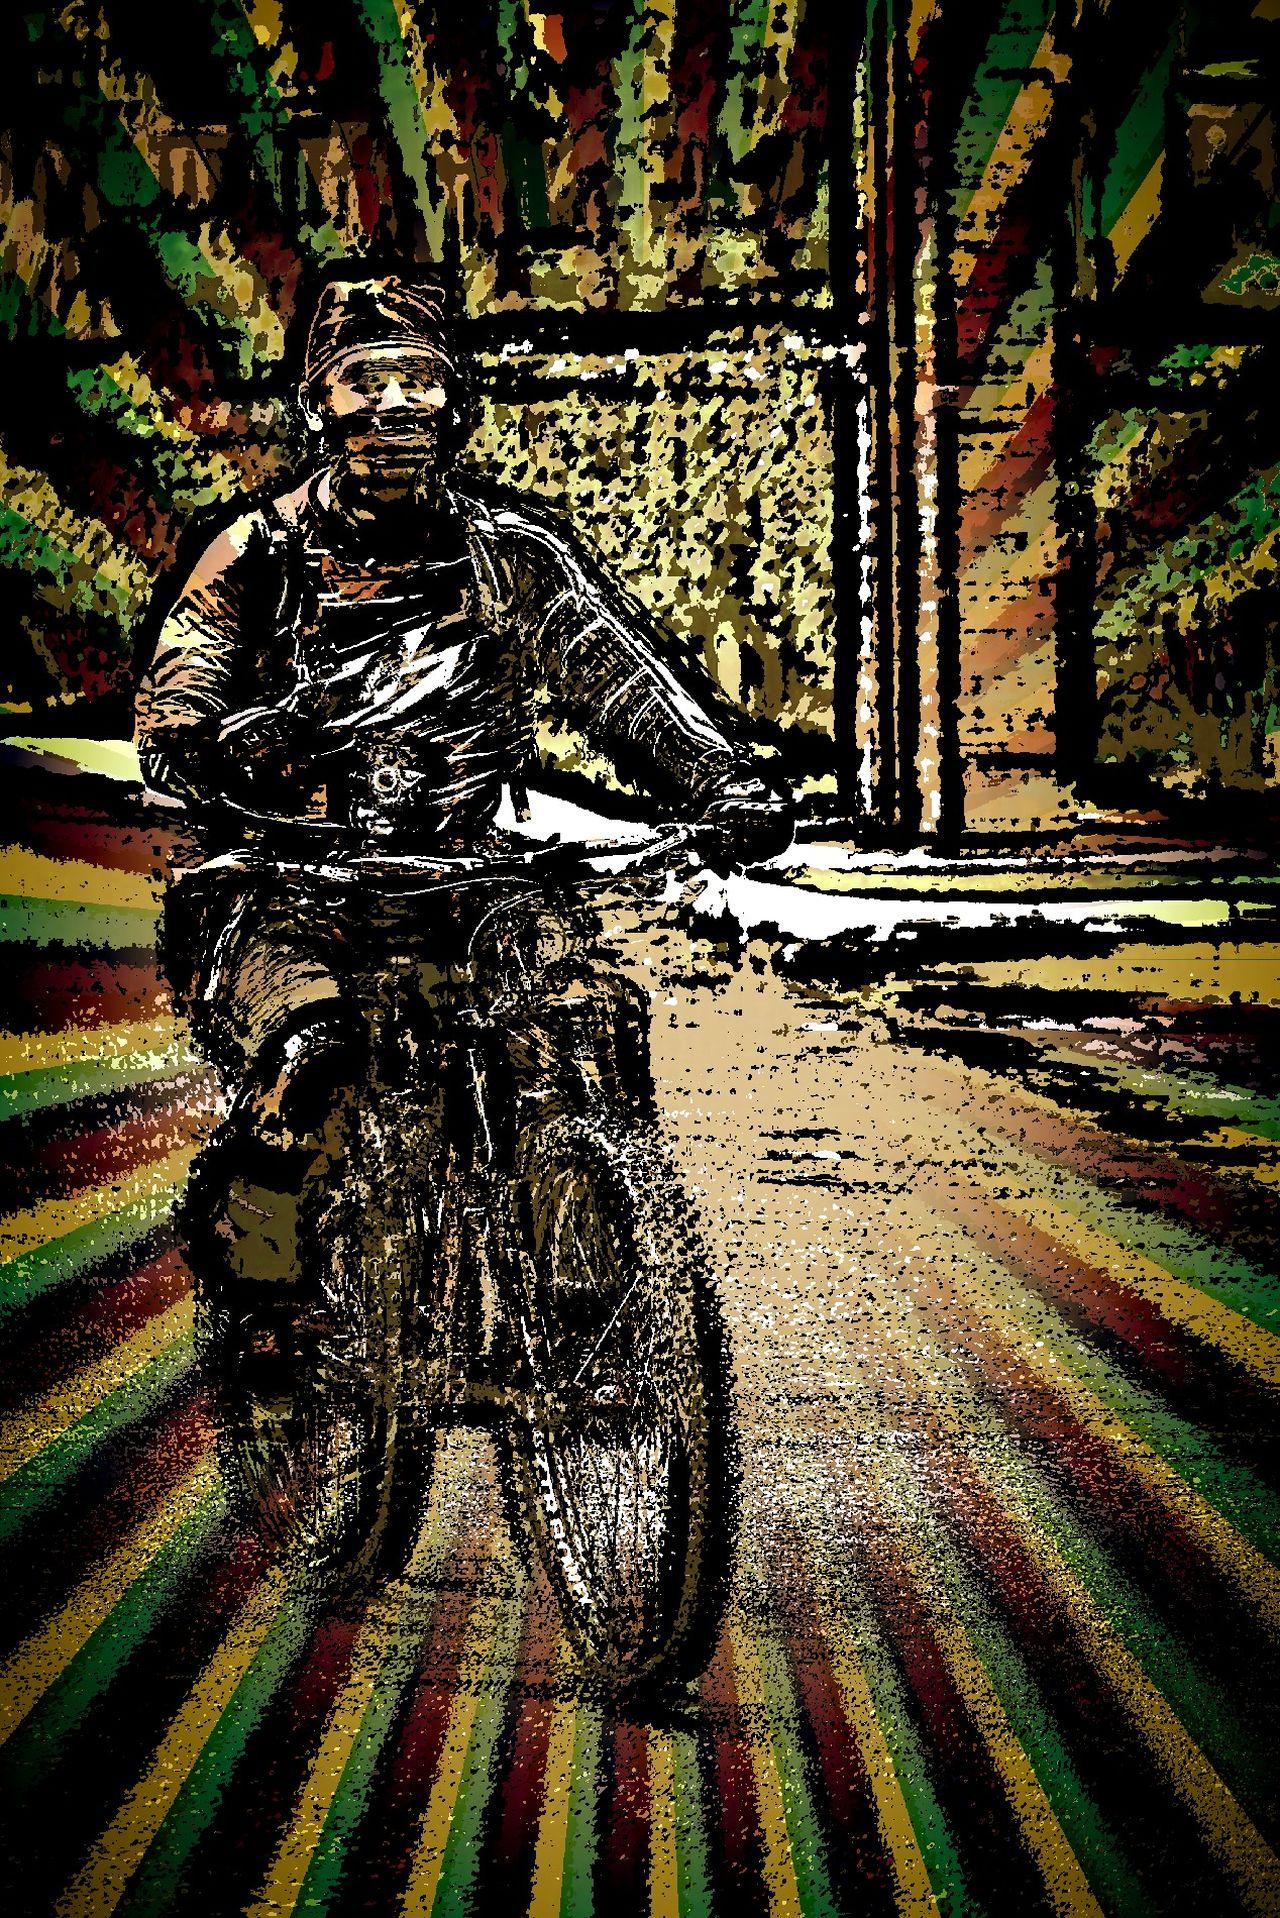 Photoart PhotoARTbyME Photoartwork Photoarteffects ArtWork Artistic Photography Mountain Biking Mountain Biker Random People Outside Photography Eye4photography  Eyeemphotography EyeEm Best Shots Bicyclists Bicycle Pedalling Bicycles Bike Ride Bike Life Bike Bicycle Adventuring Cyclist Outdoor Sport Cycle New Art